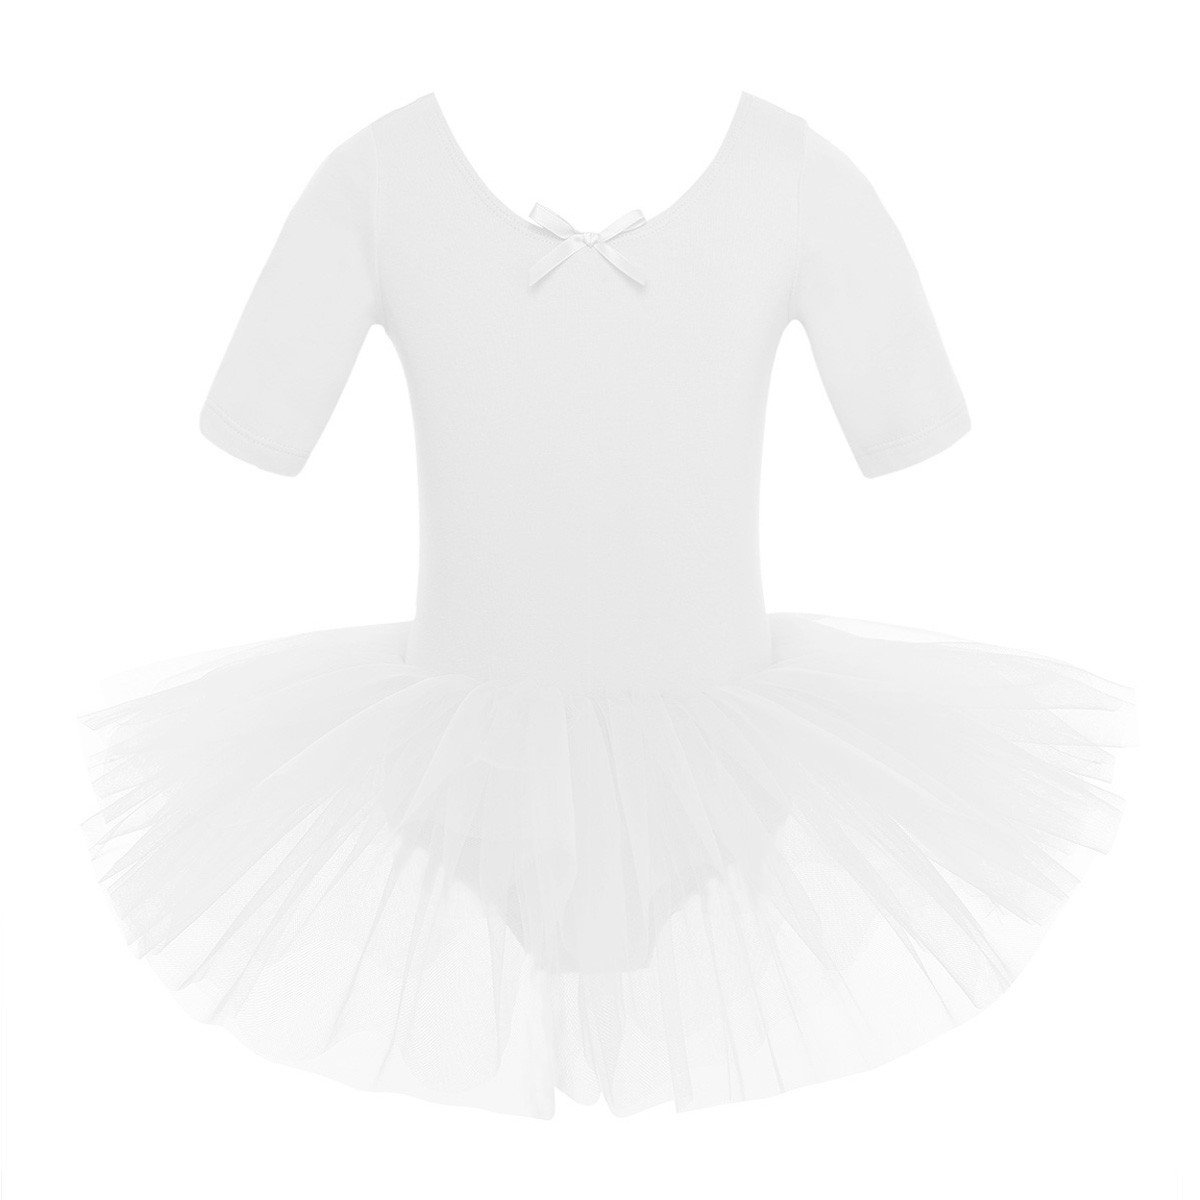 Agoky Baile de Ballet Vestido de Ni/ña Maillot Traje de Ballet Tut/ú Leotardo Princess Girls Falda de Tul Traje de Carnaval